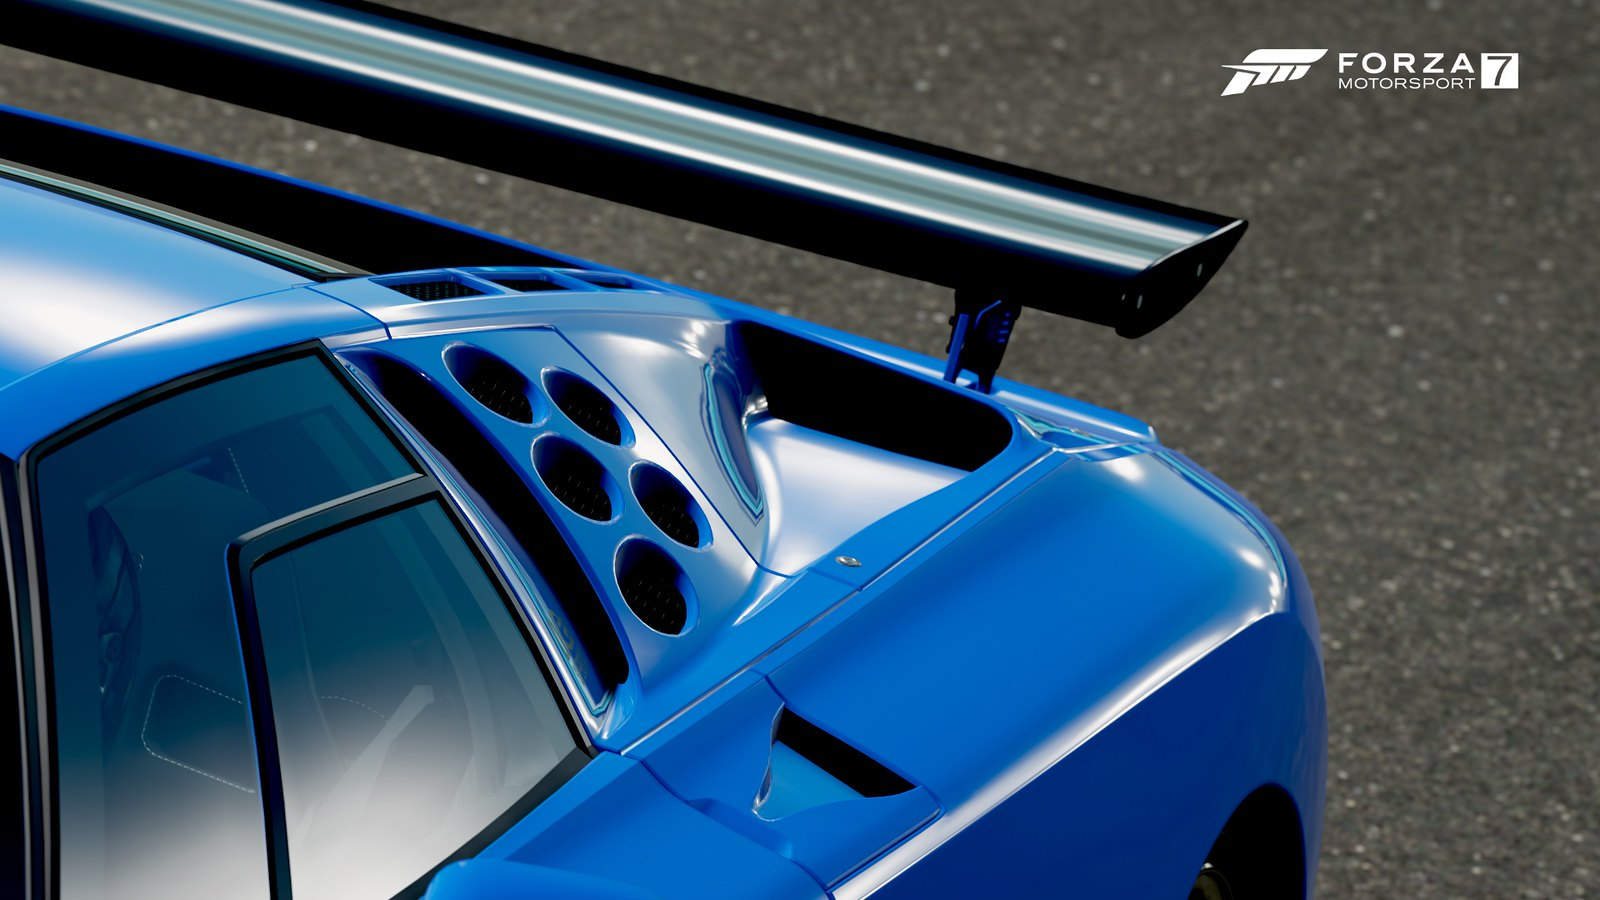 25705970867_062dc0e4cc_h ForzaMotorsport.fr